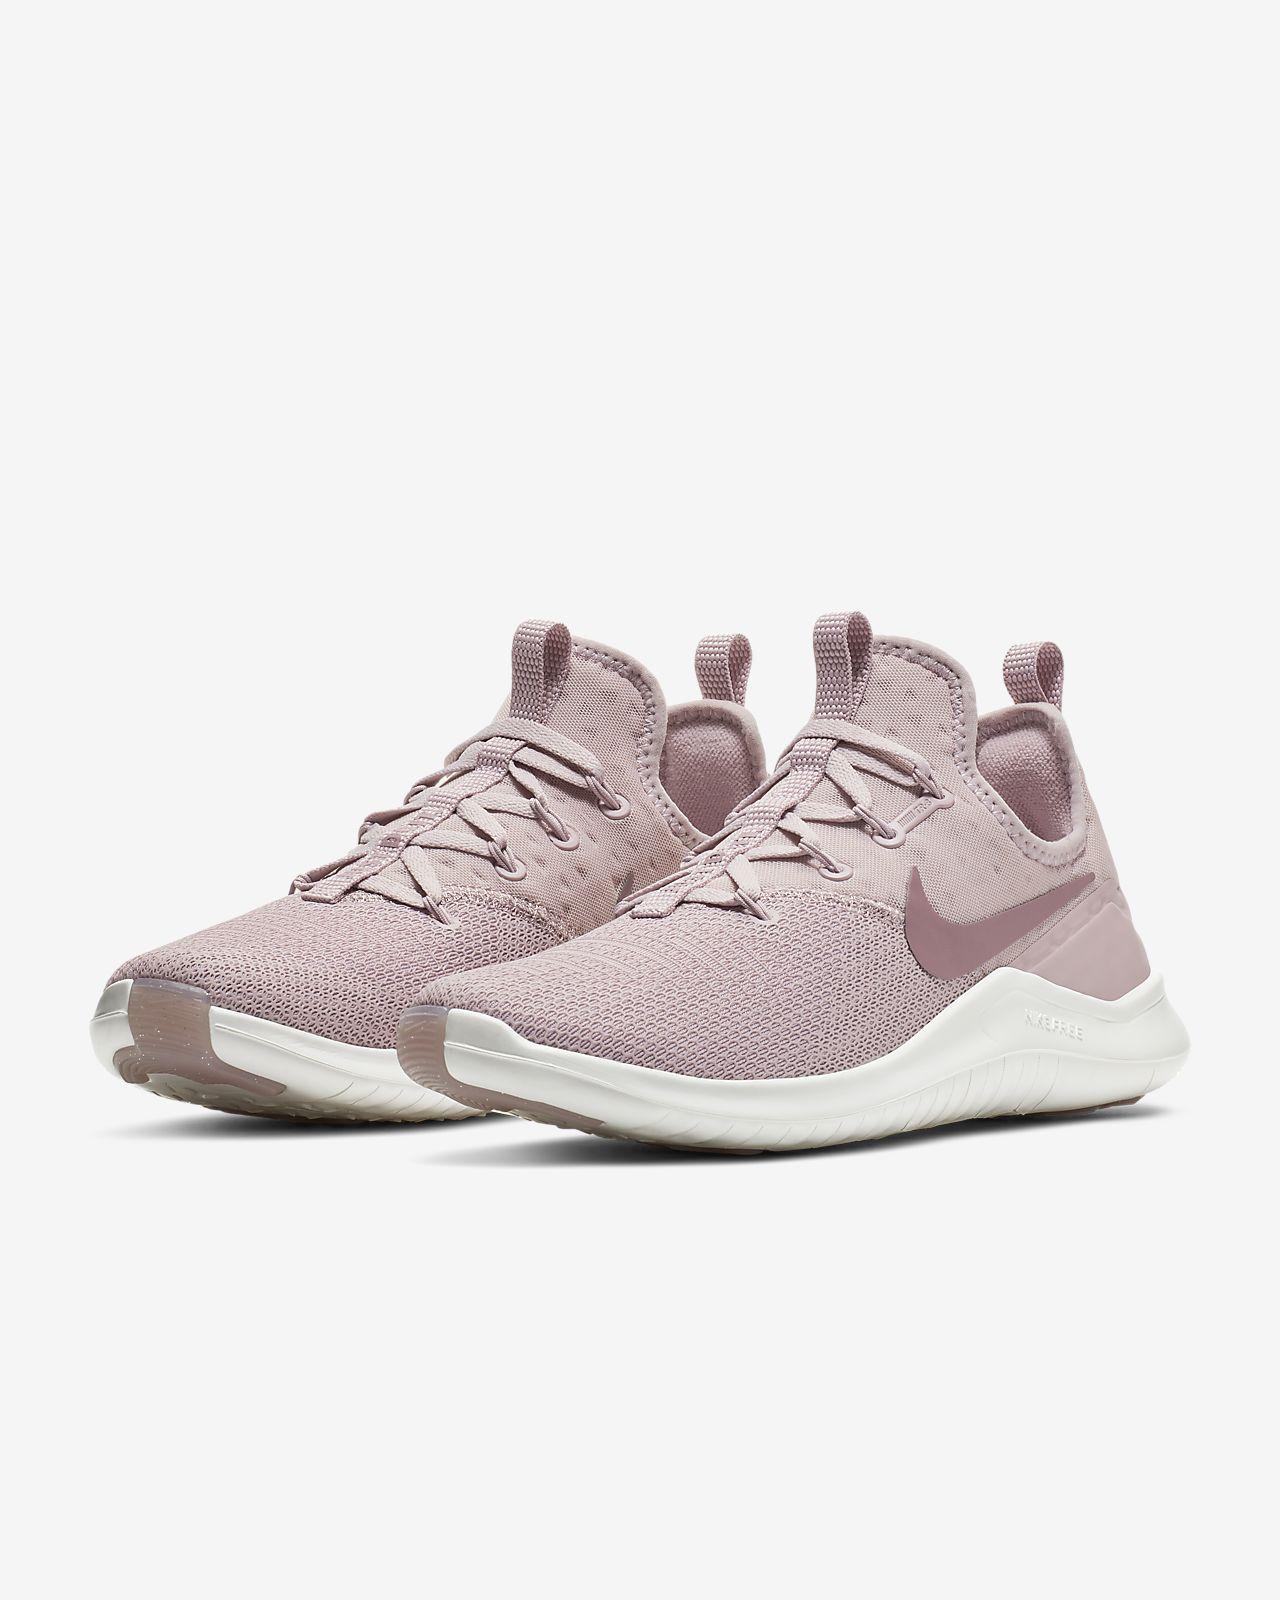 999e517d5f13 Nike Free TR8 Women s Gym HIIT Cross Training Shoe. Nike.com